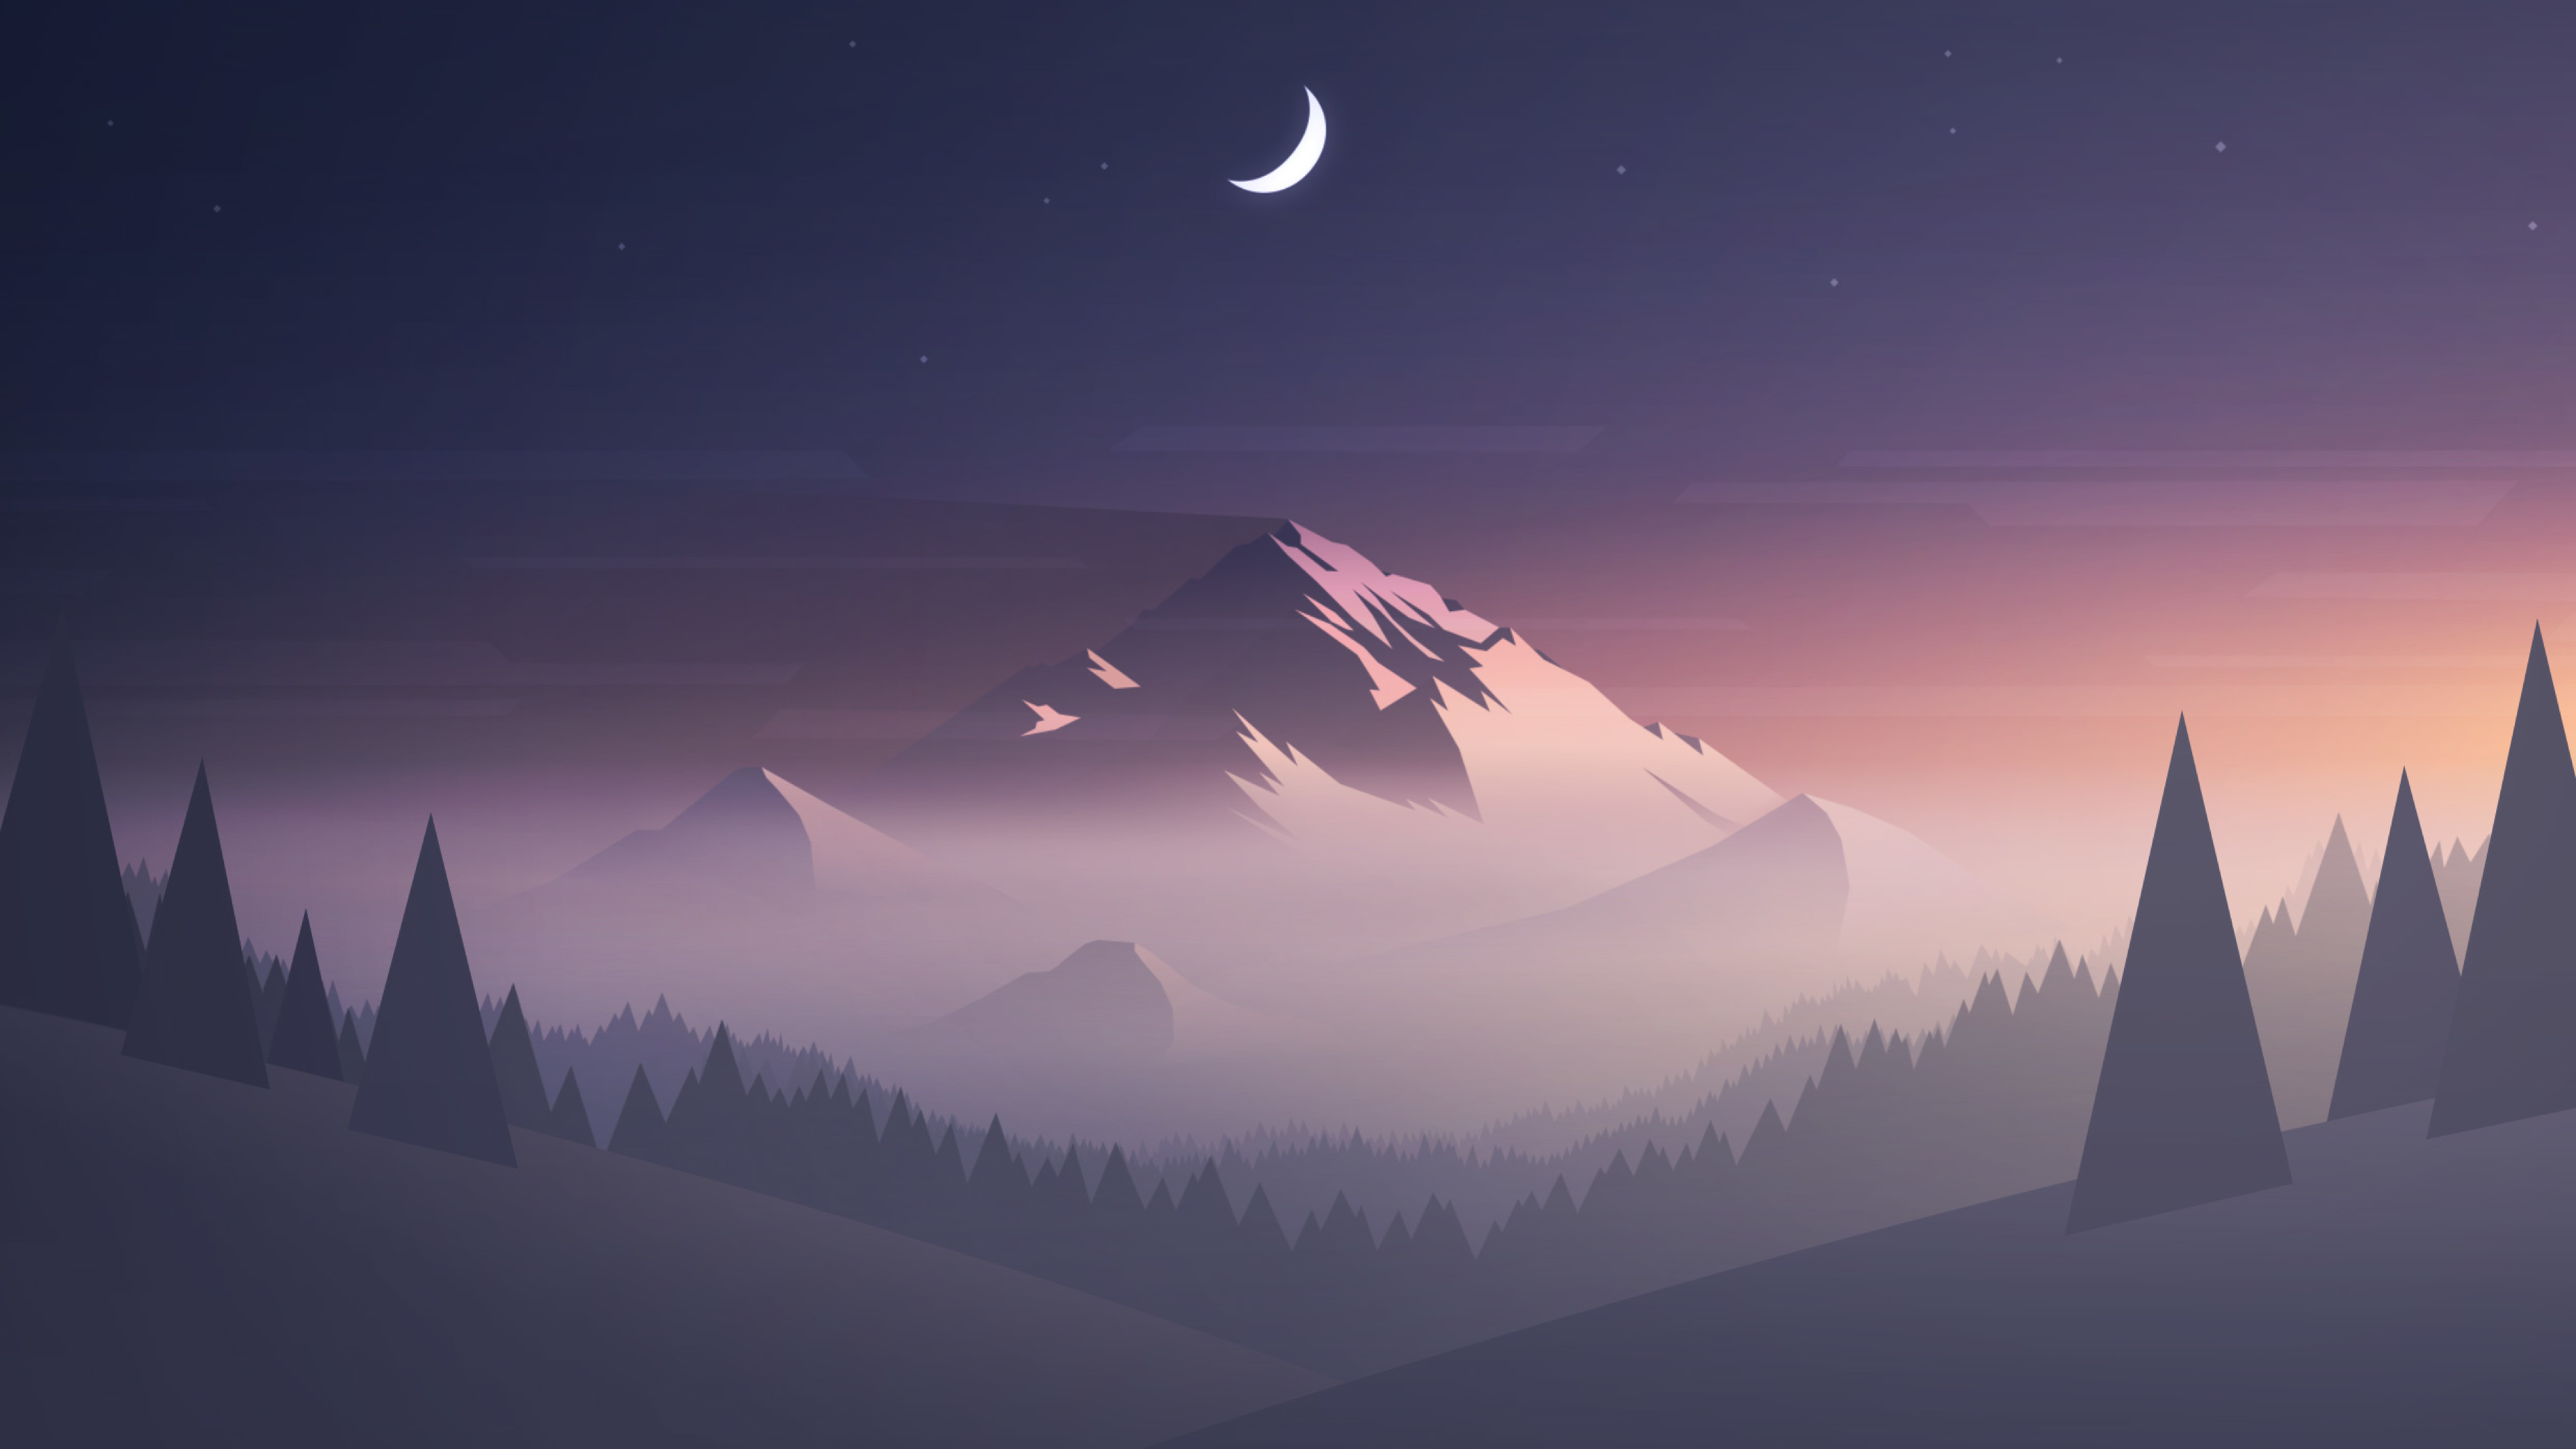 Wallpaper Mountain Minimal Half Moon Hd Creative: Download Mountains Moon Trees Minimal 480x854 Resolution